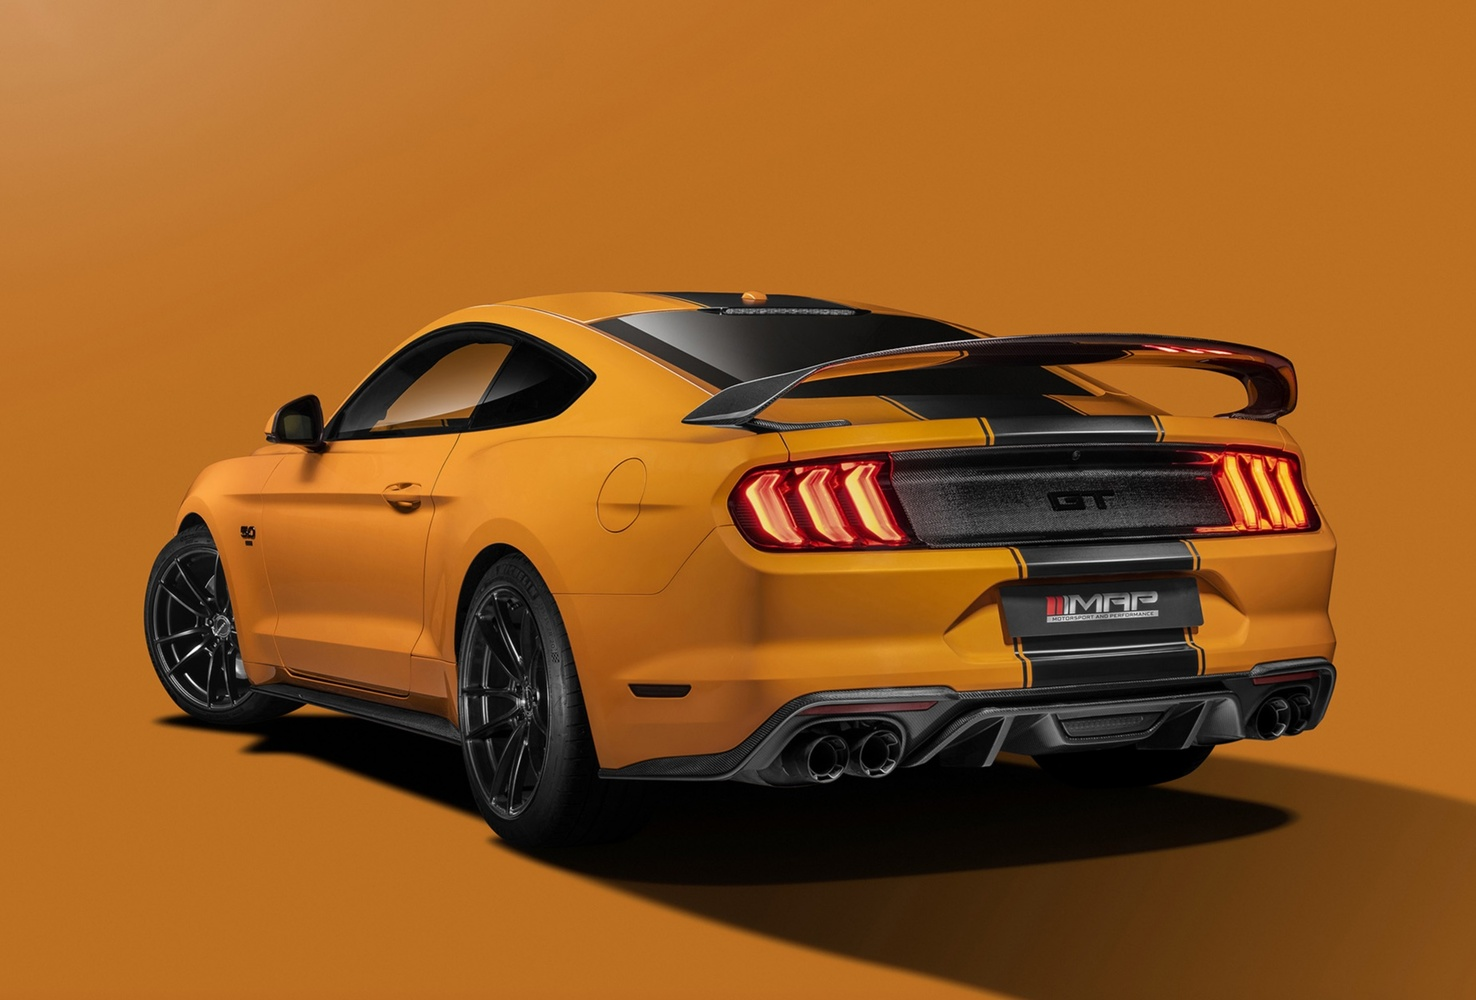 Orange Mustang by Graham Taylor